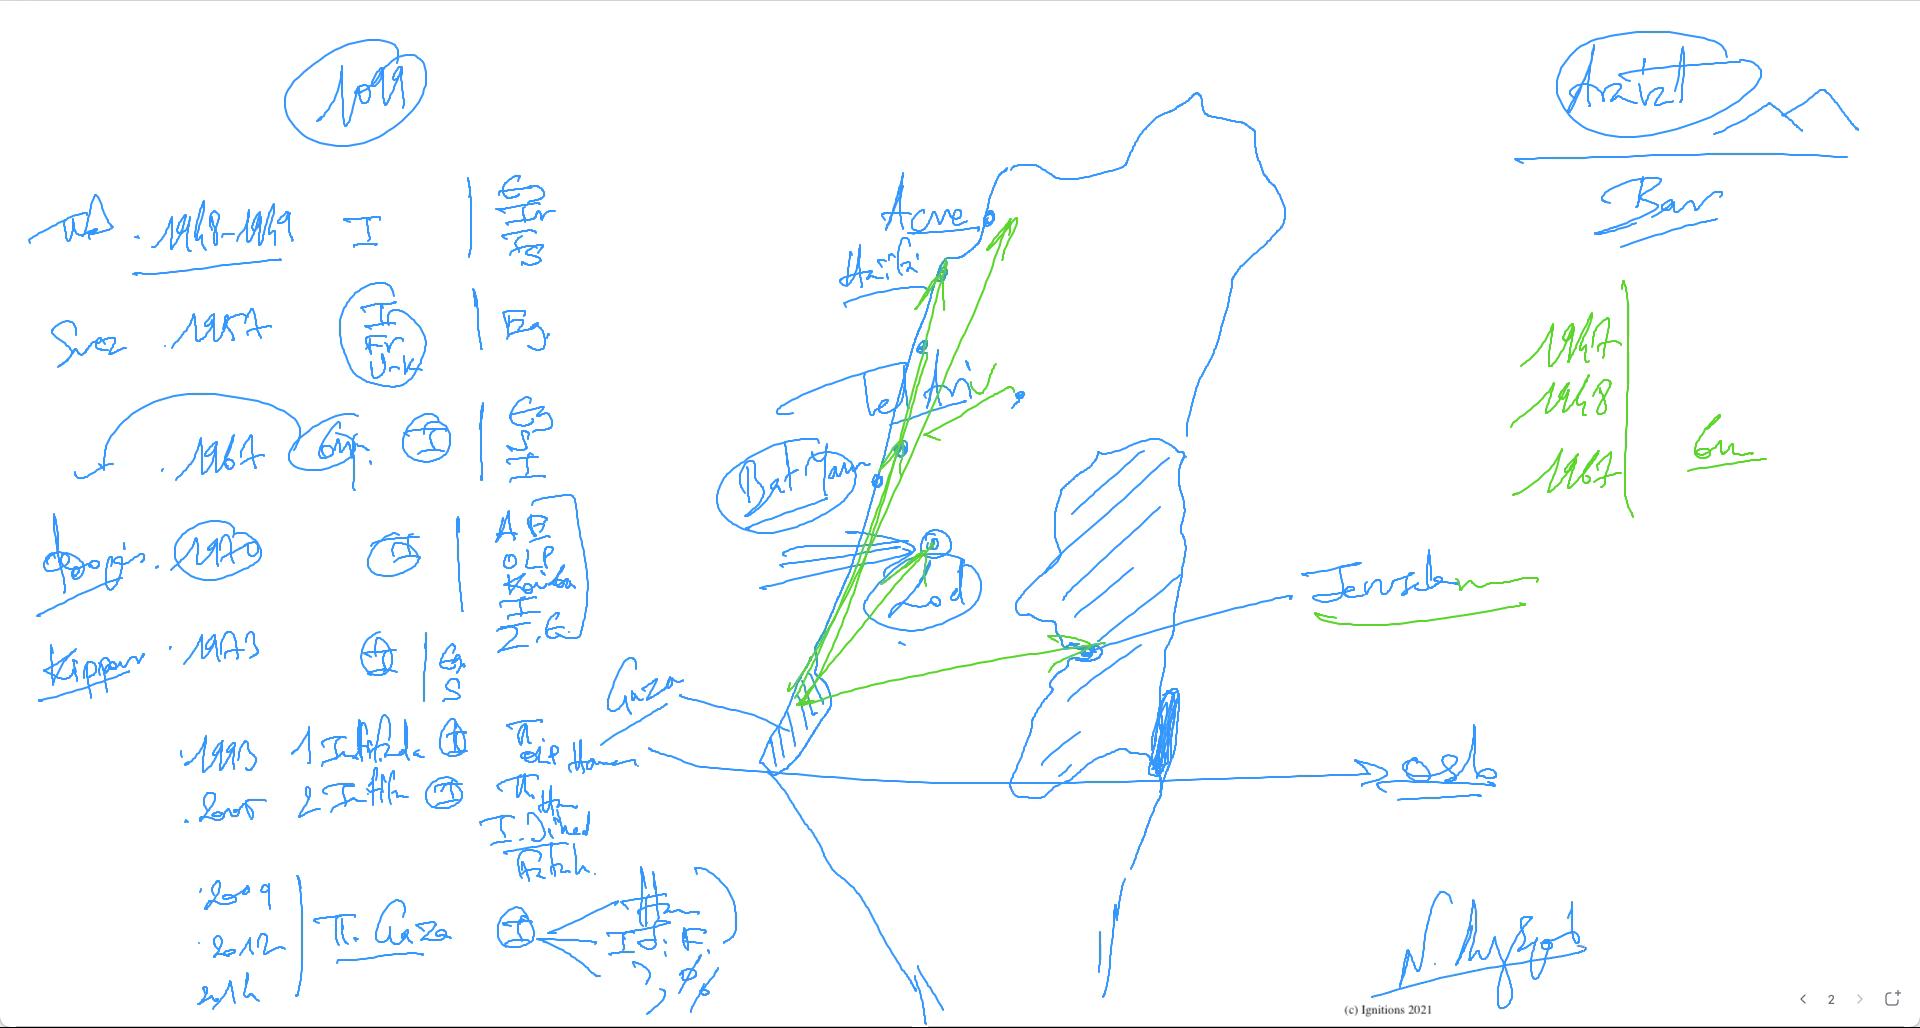 61558 - e-Μάθημα IV: Ιστορικό συγκρούσεων στο Ισραήλ. (Dessin)